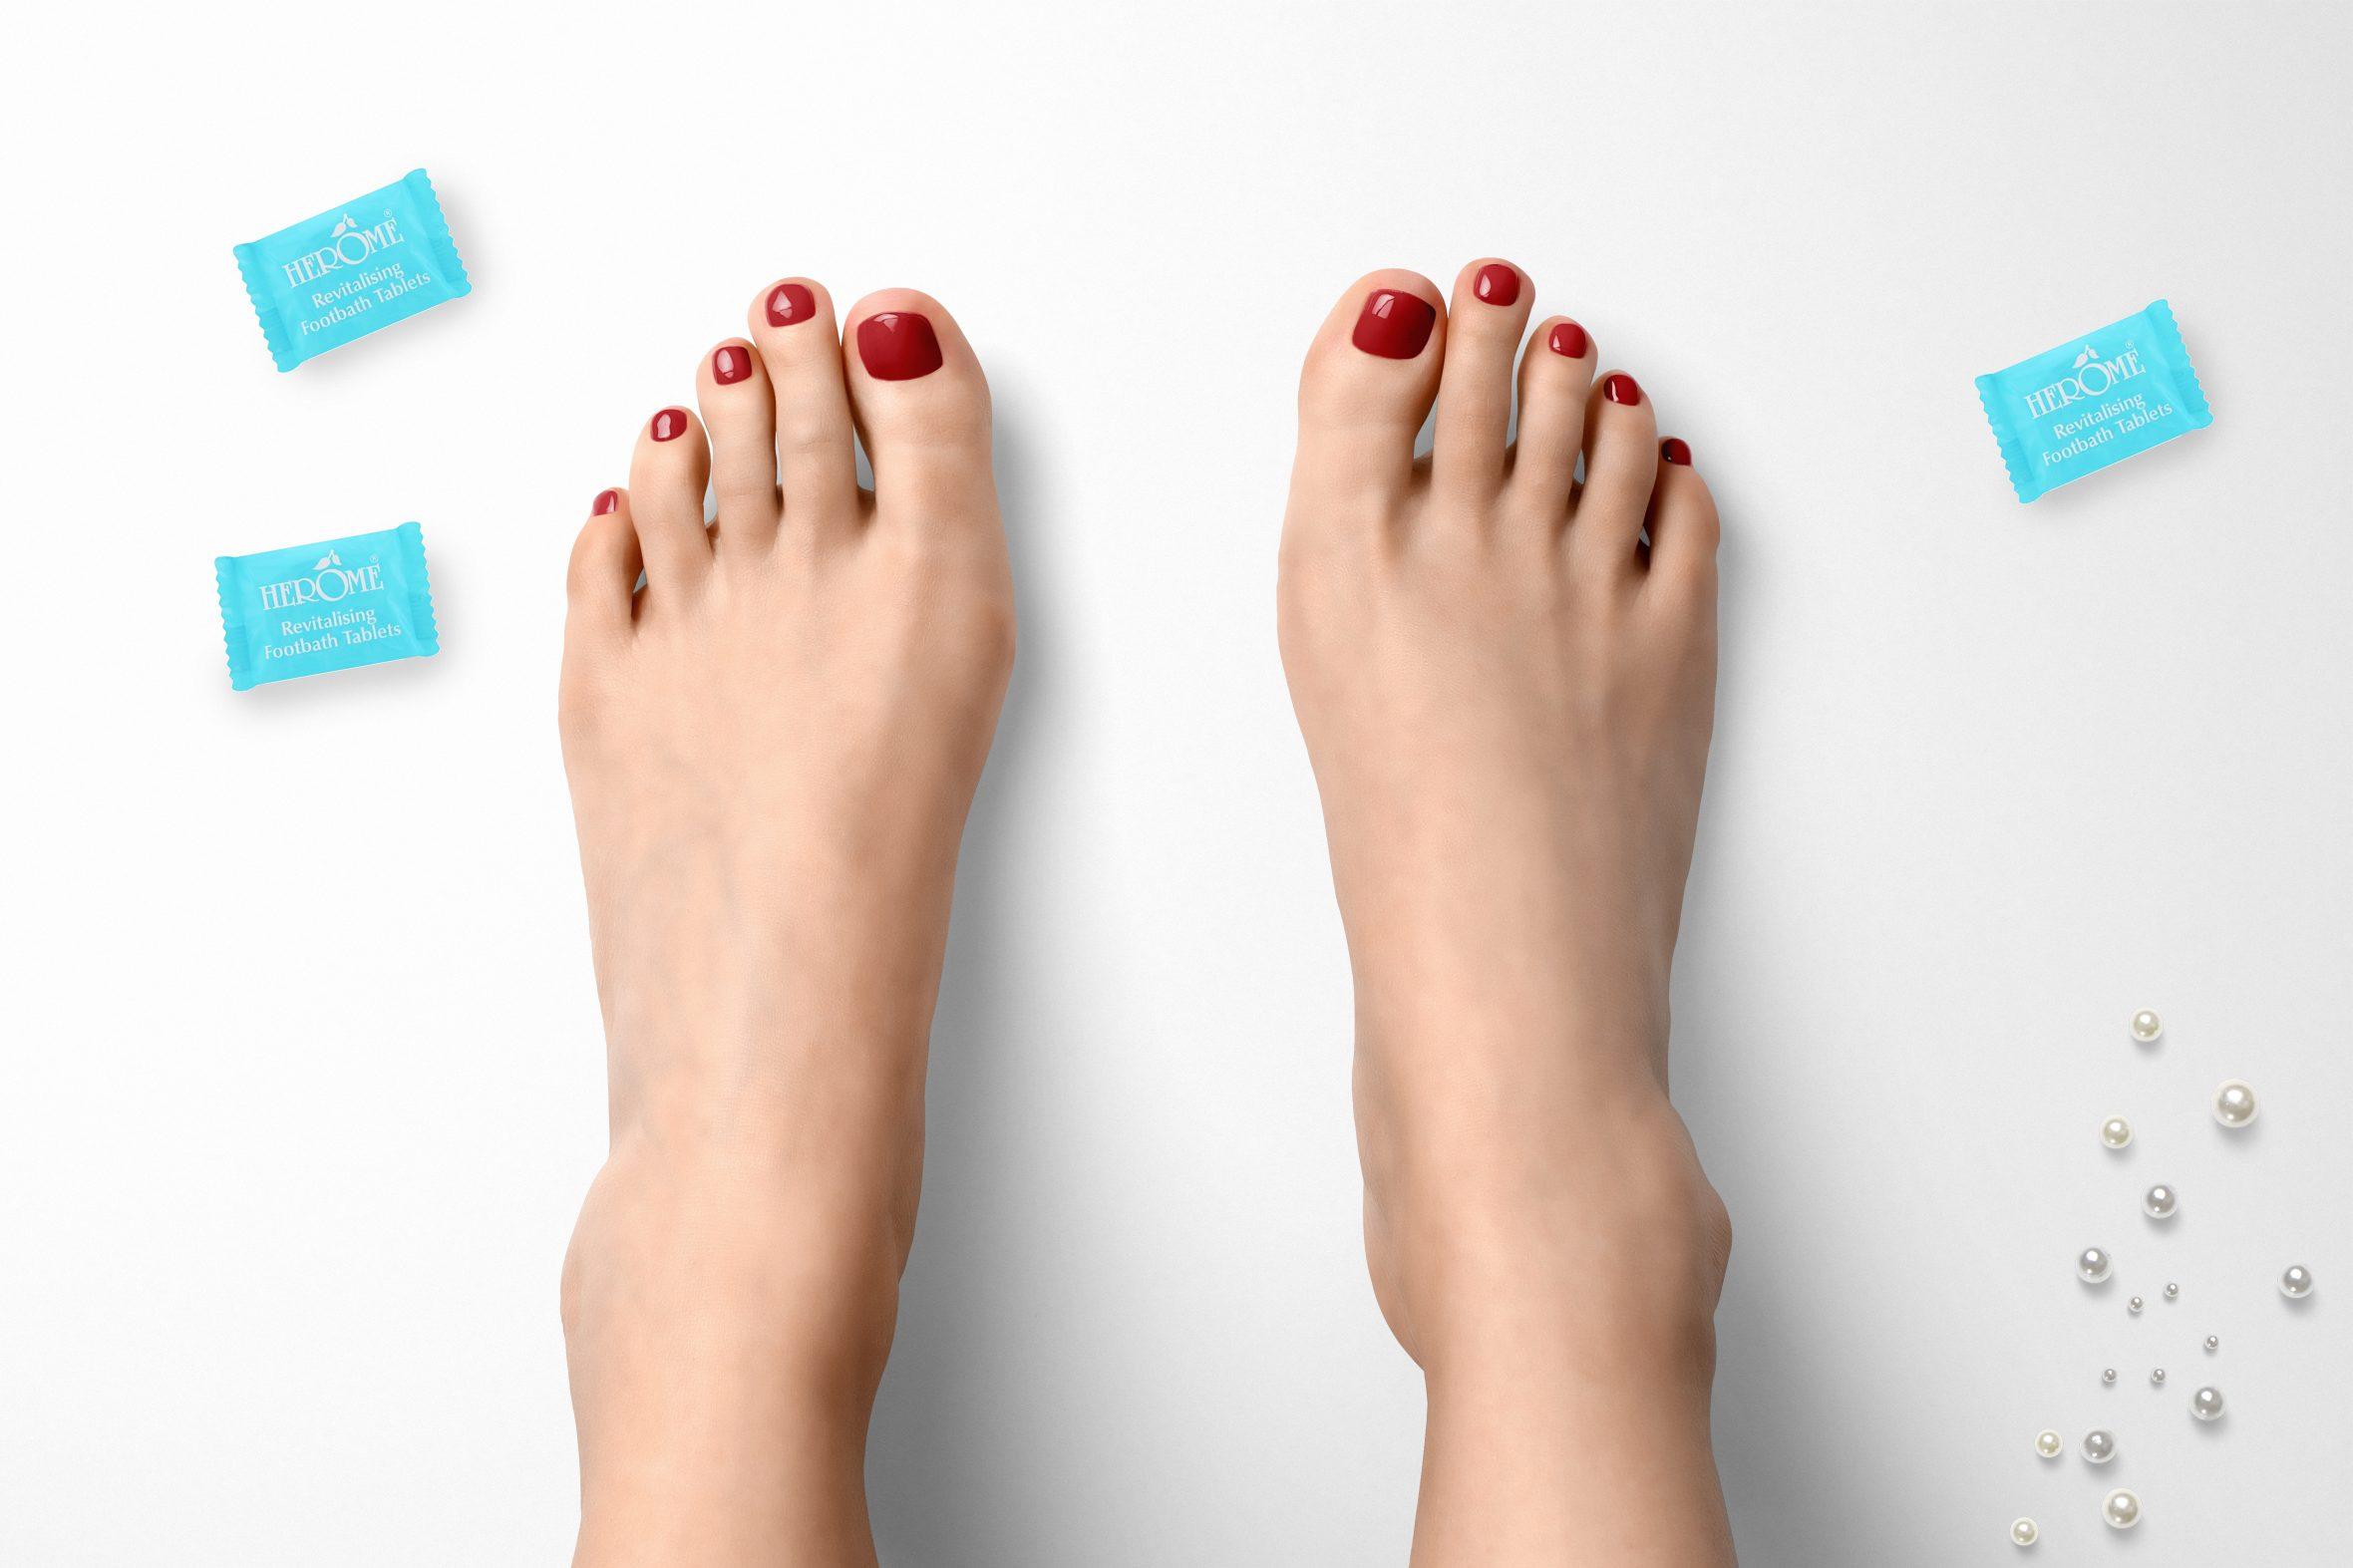 Rode nagellak van Herôme voor mooie pedicure